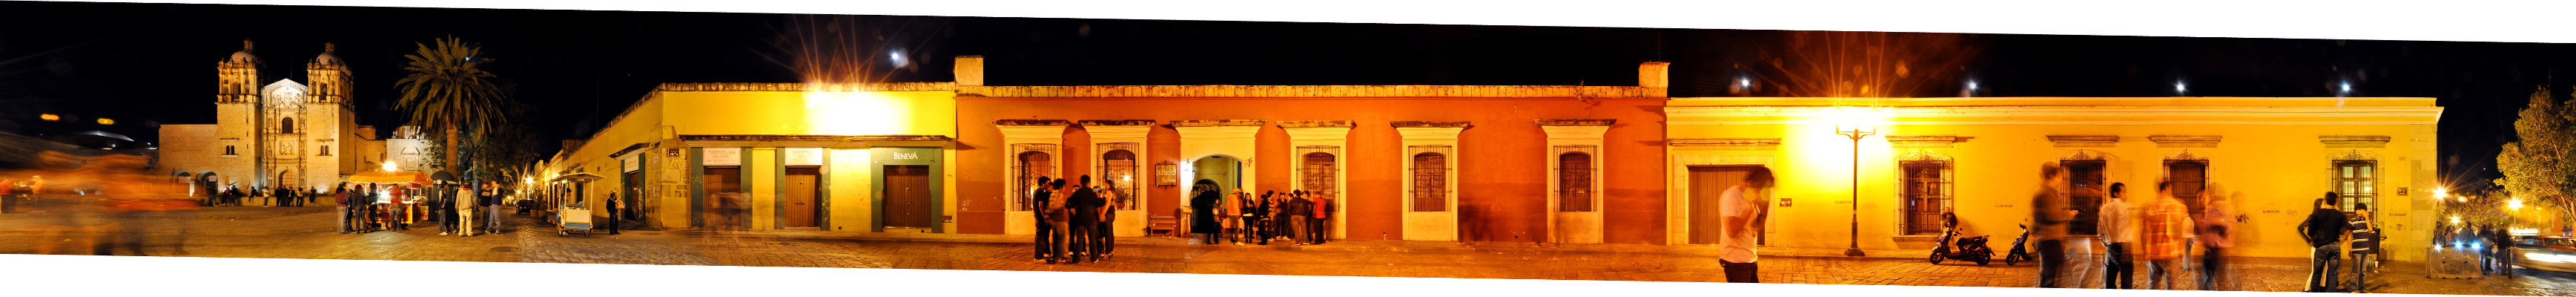 Nachtleben Straßenszene • Oaxaca • Mexiko